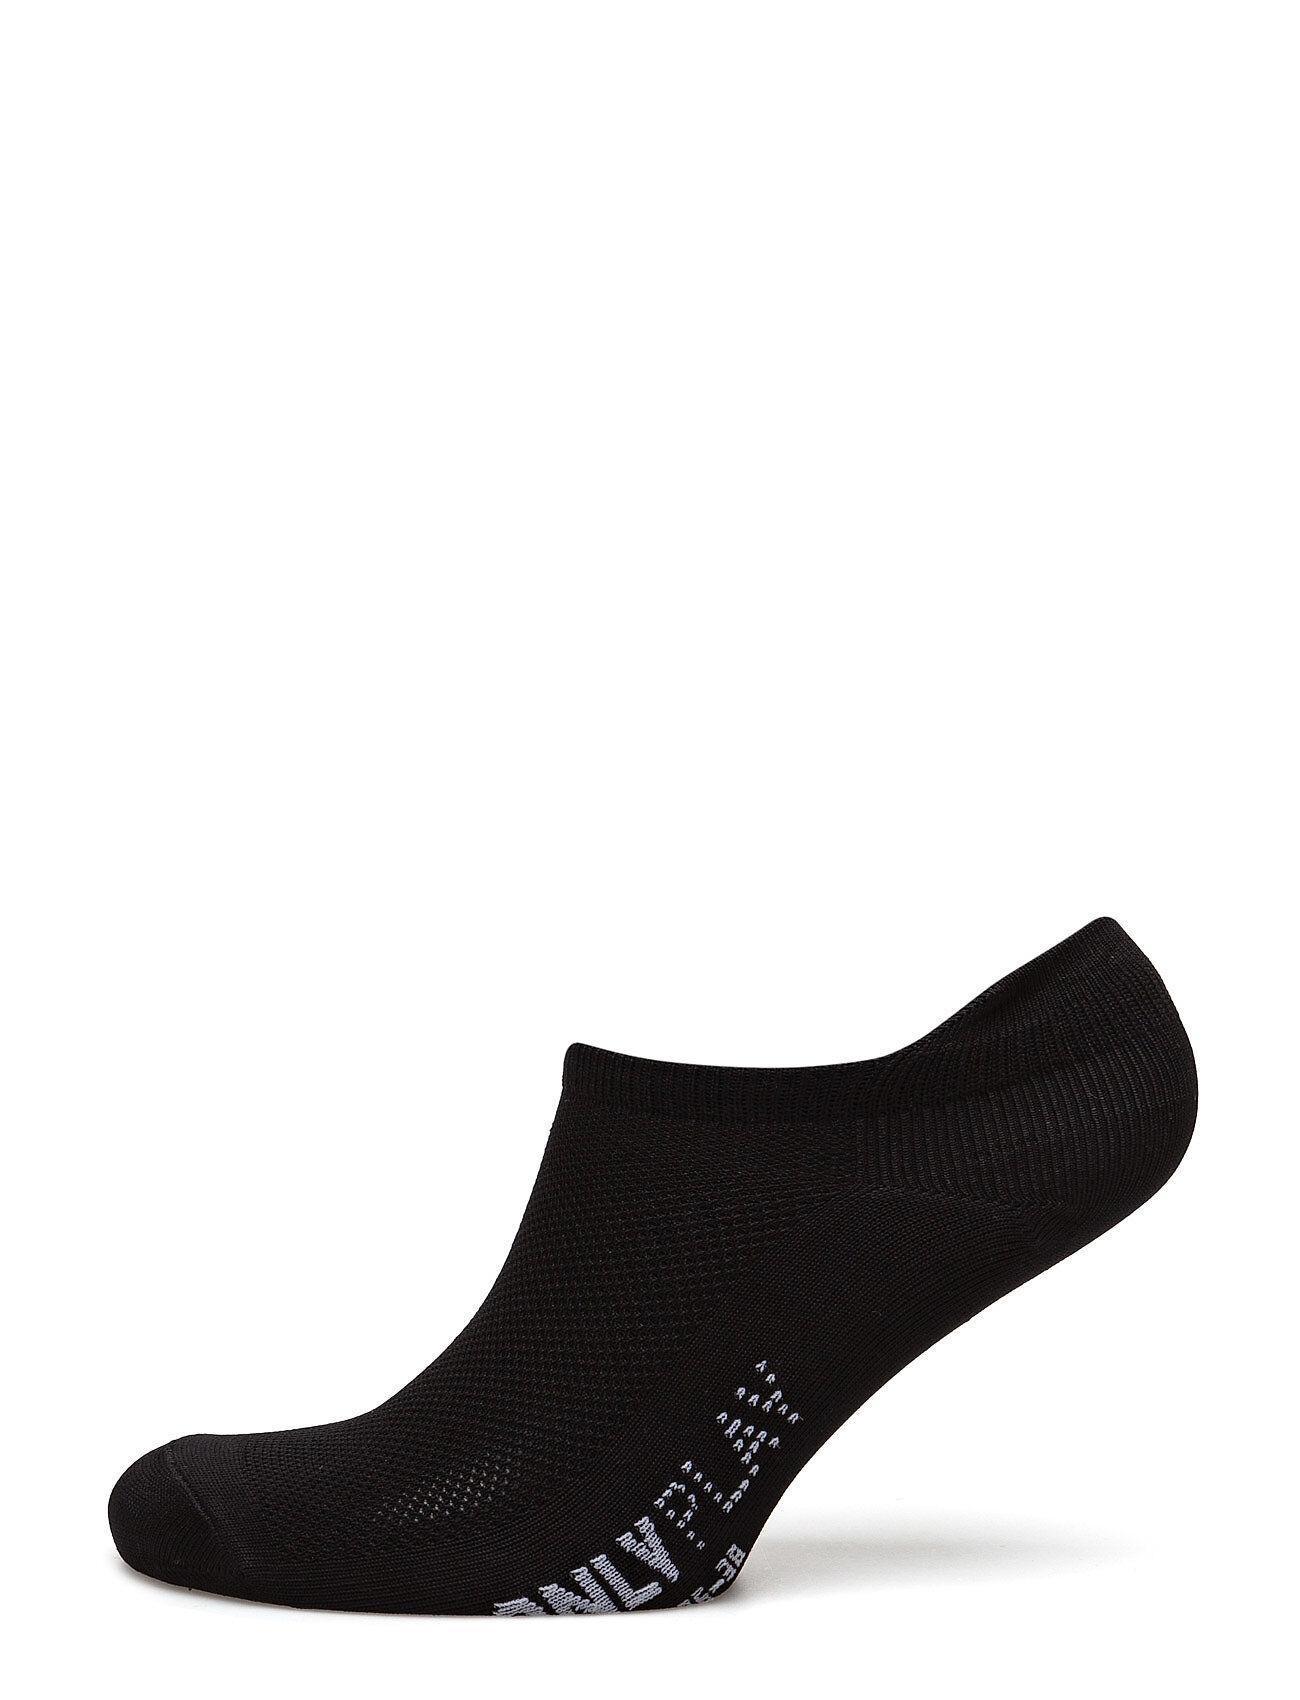 Image of ONLY PLAY Onptraining Socks - Opus Nilkkasukat Lyhytvartiset Sukat Musta ONLY PLAY